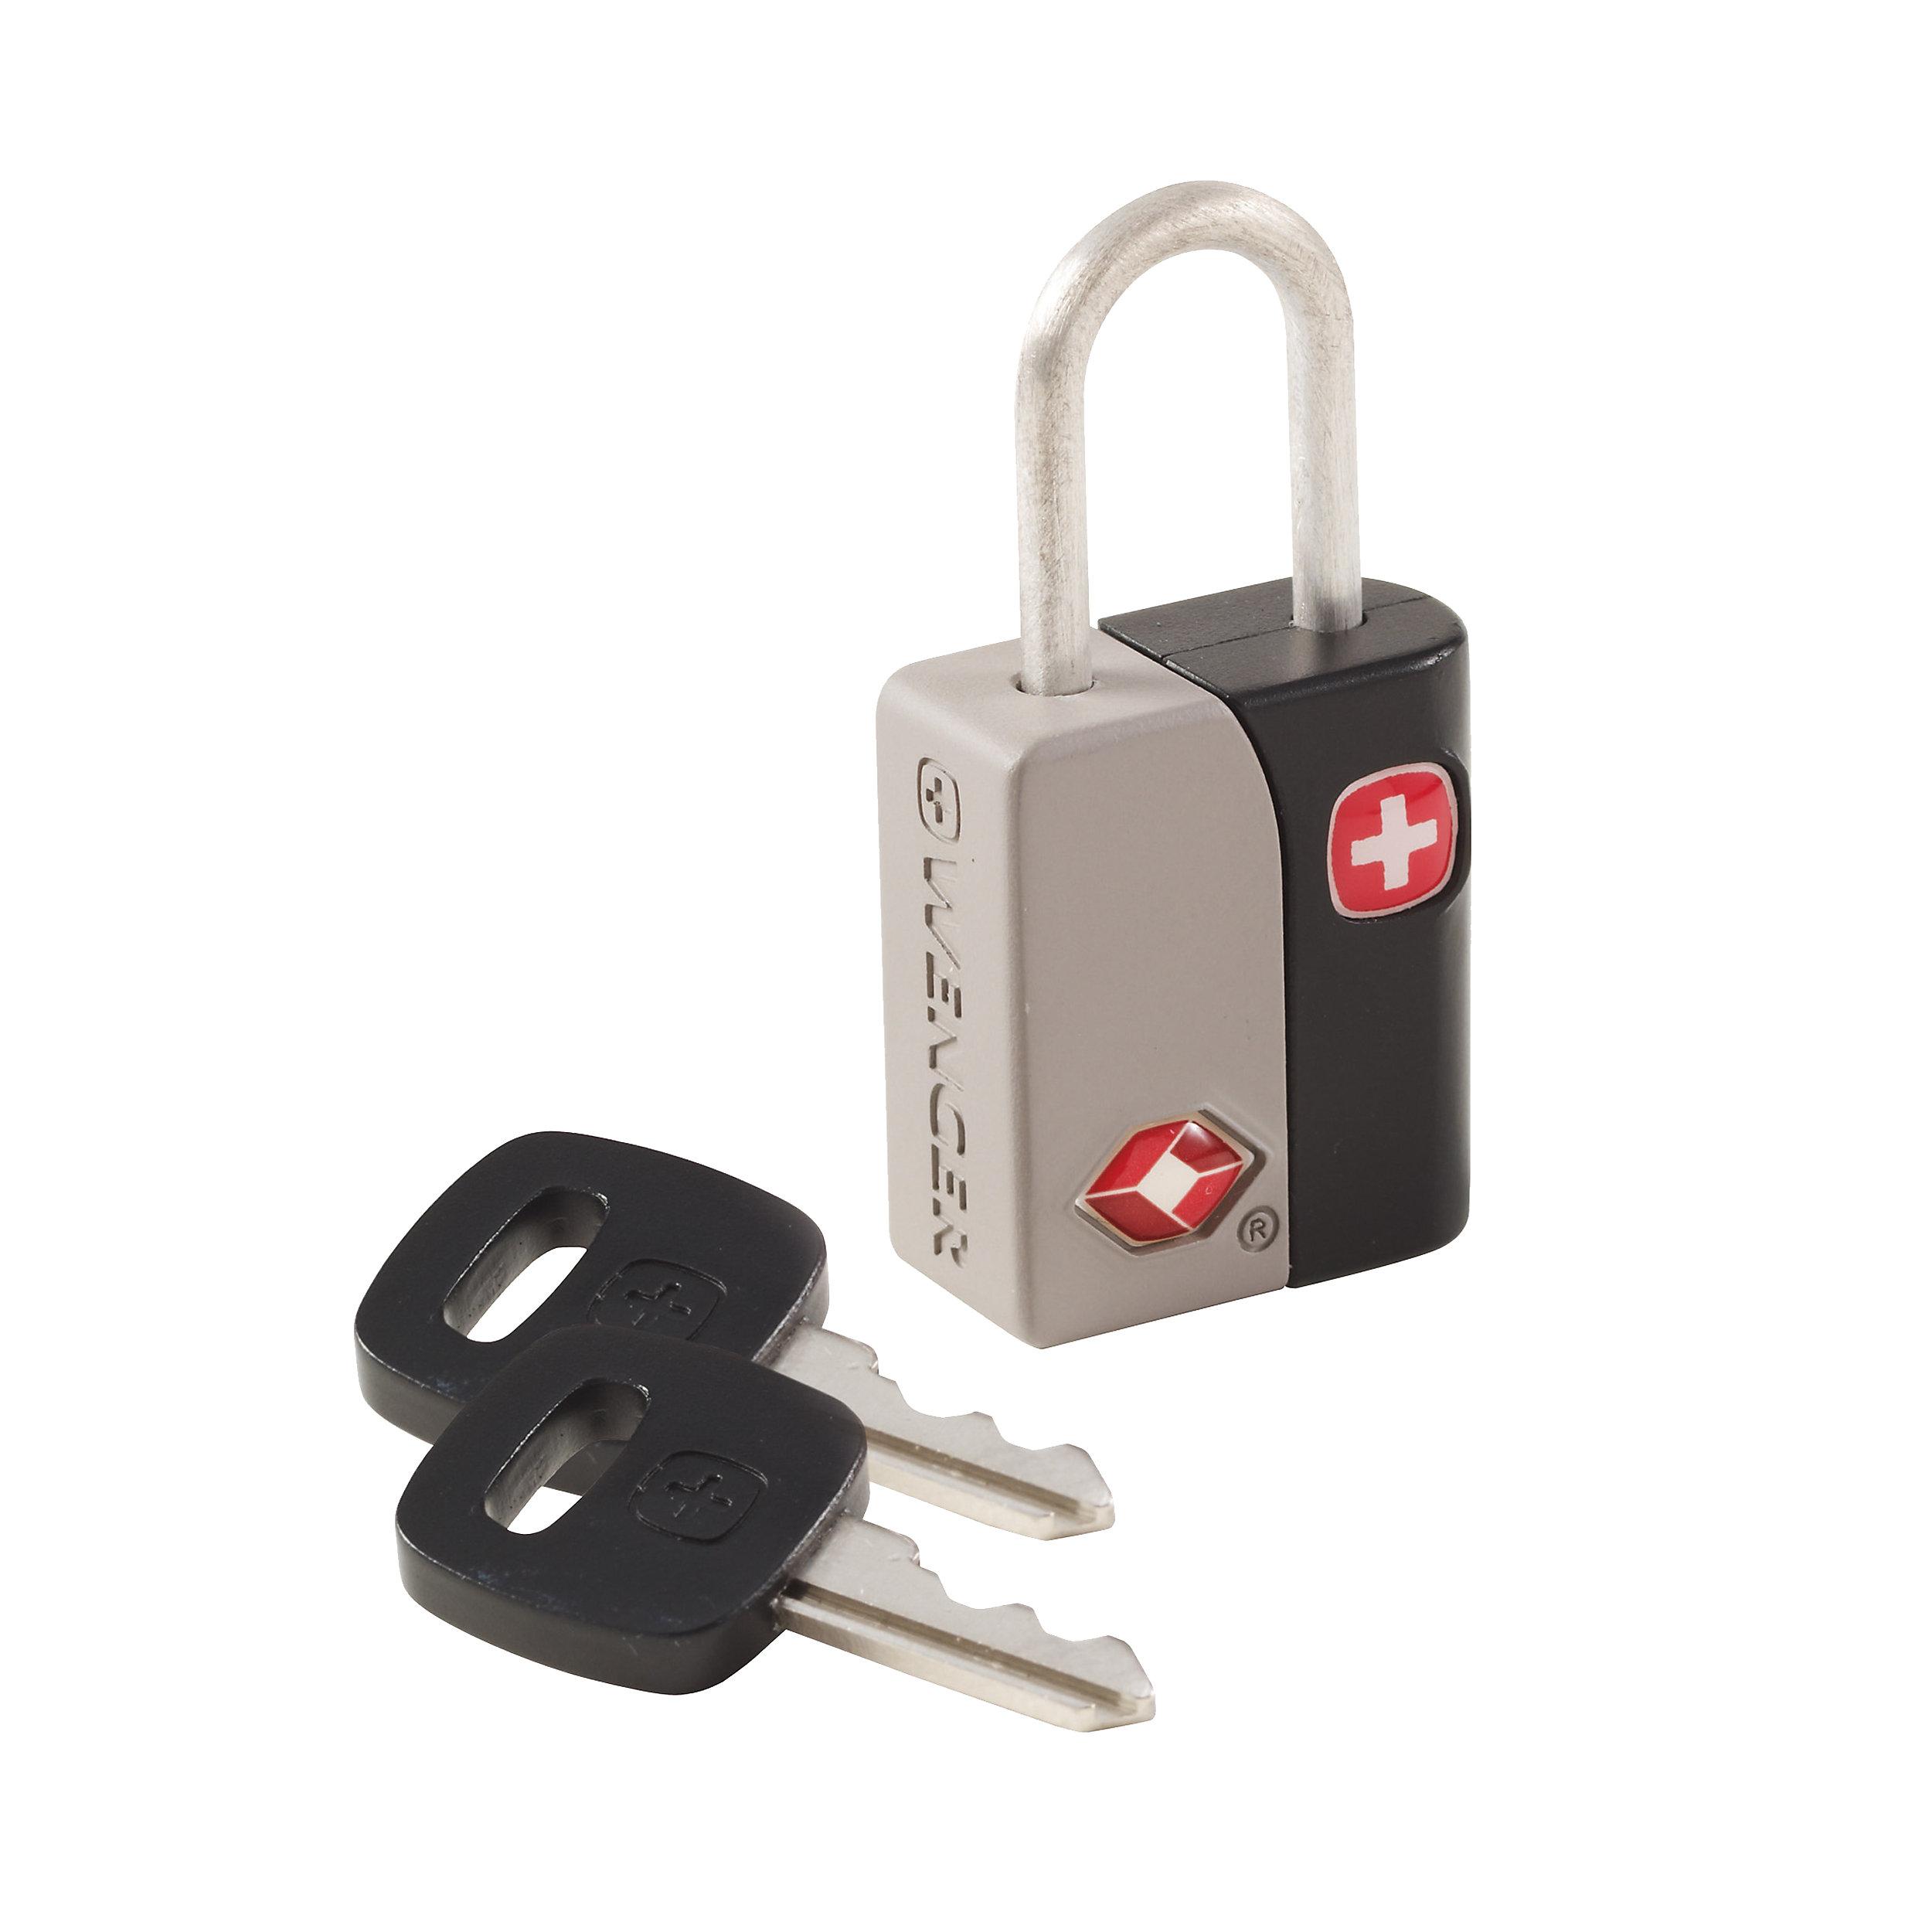 Travel Sentry® Key-Locks-set of 2 Travel accessories